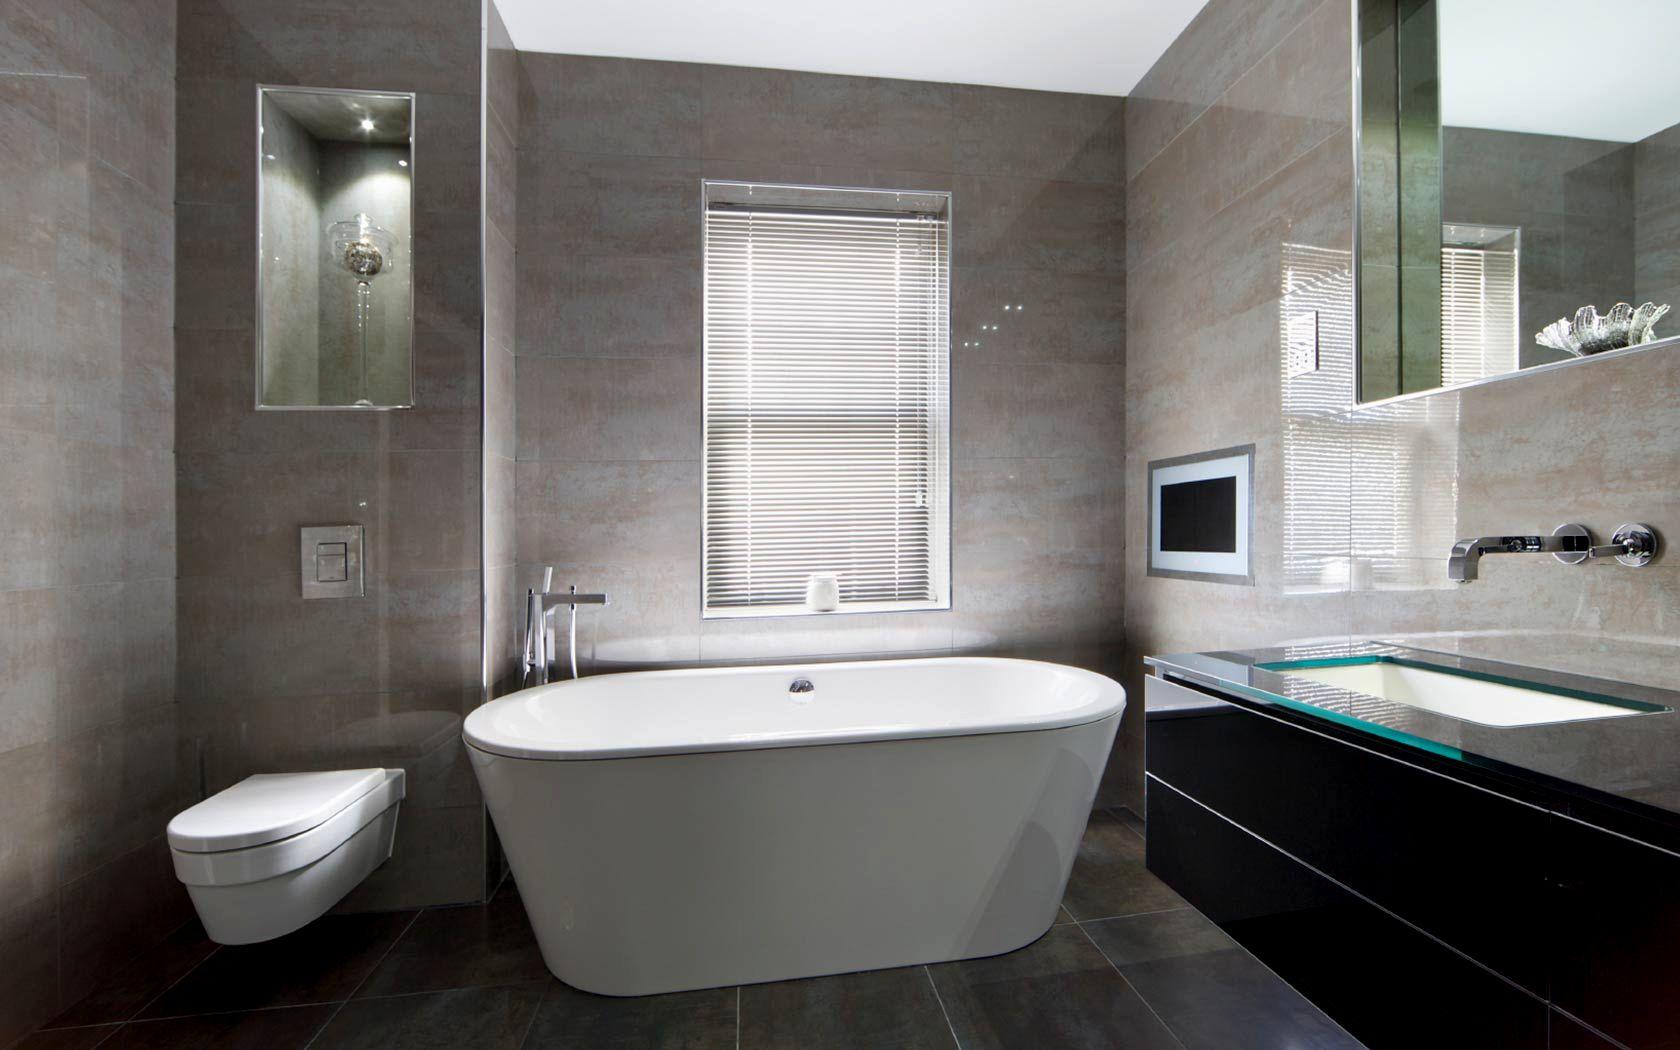 fancy bathroom accent tile image-Stunning Bathroom Accent Tile Photograph